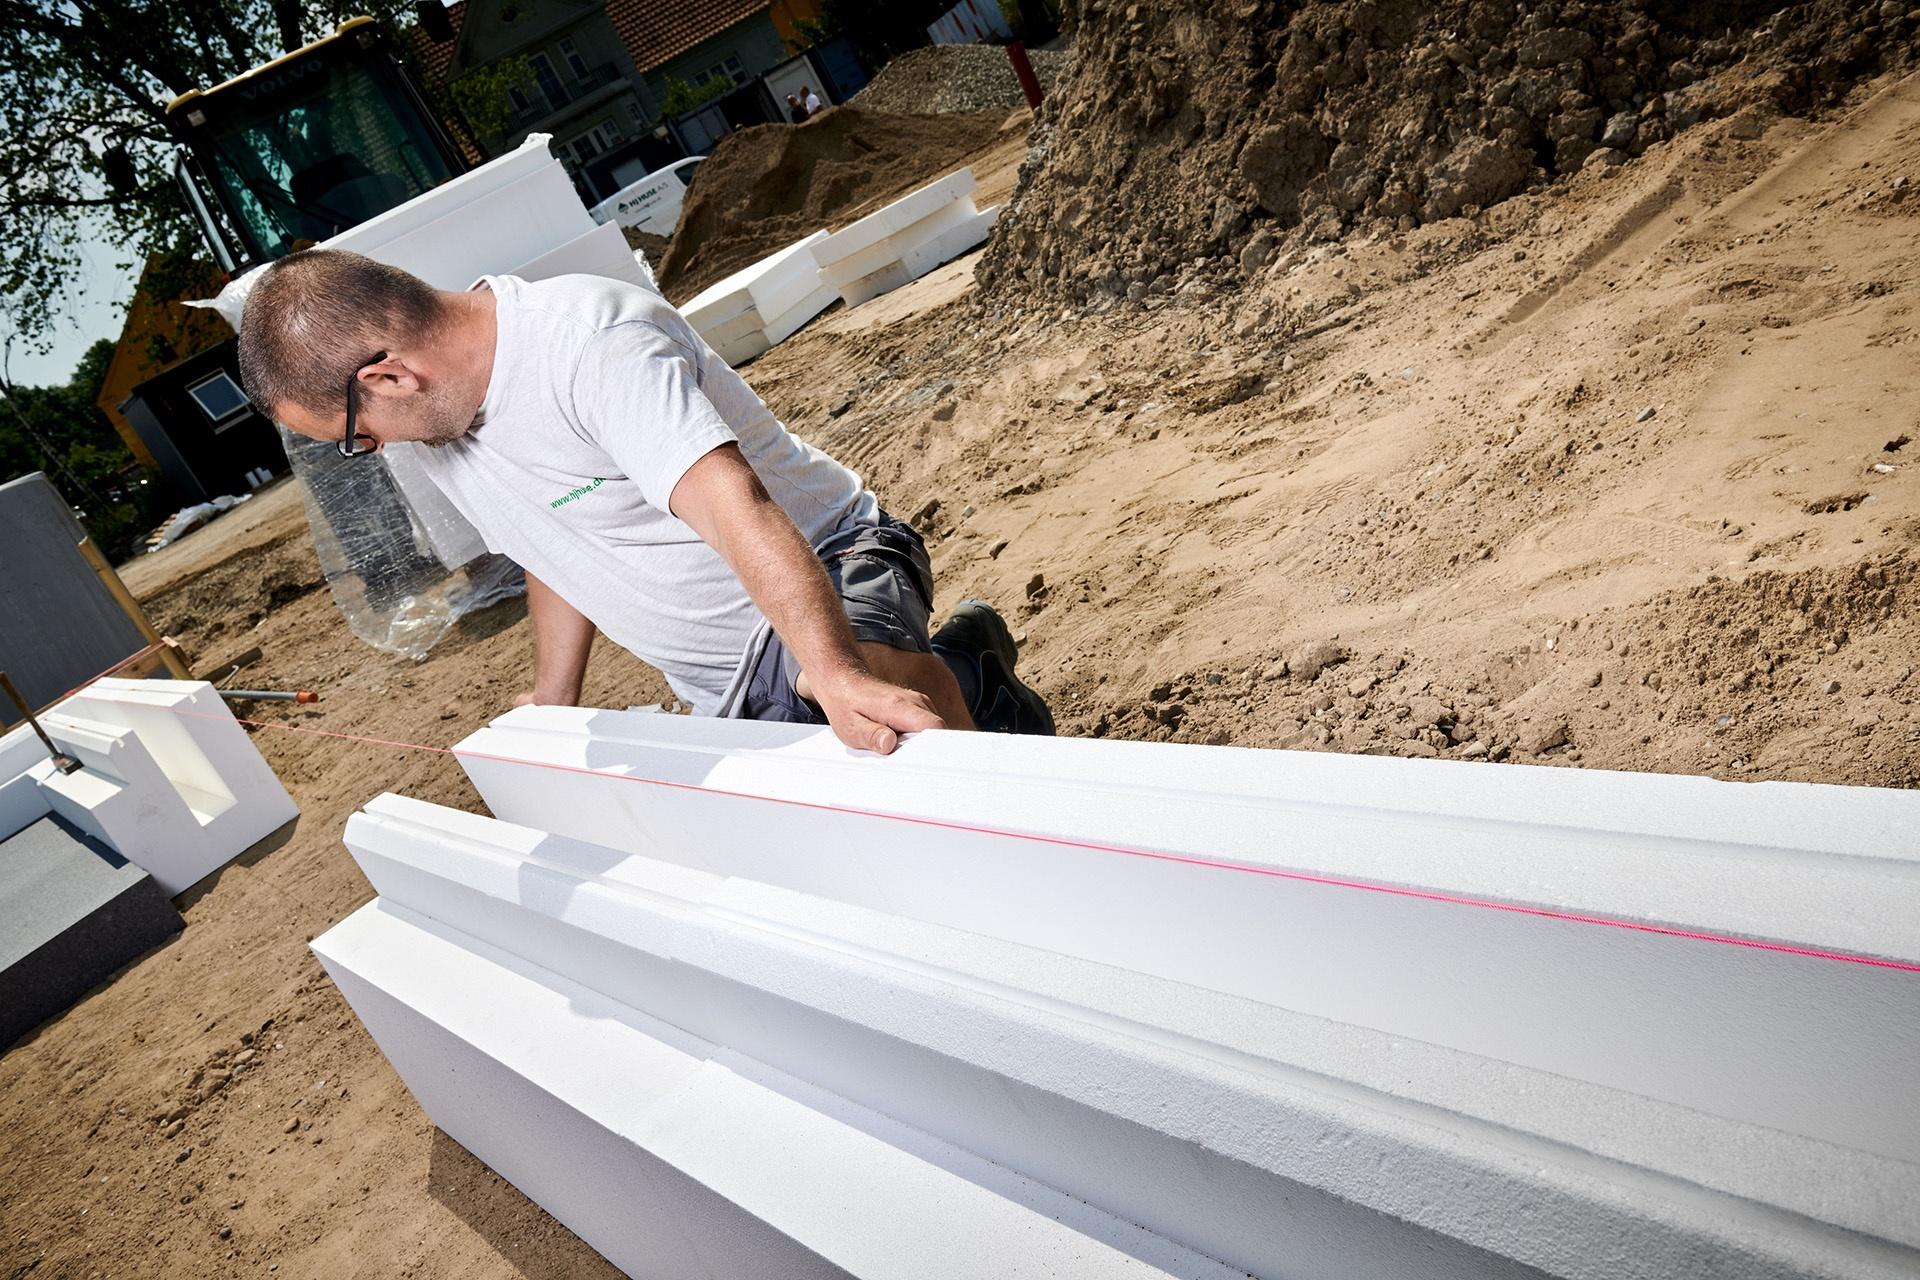 Sundolitt: Entreprenører gør bæredygtigt byggeri til en god forretning